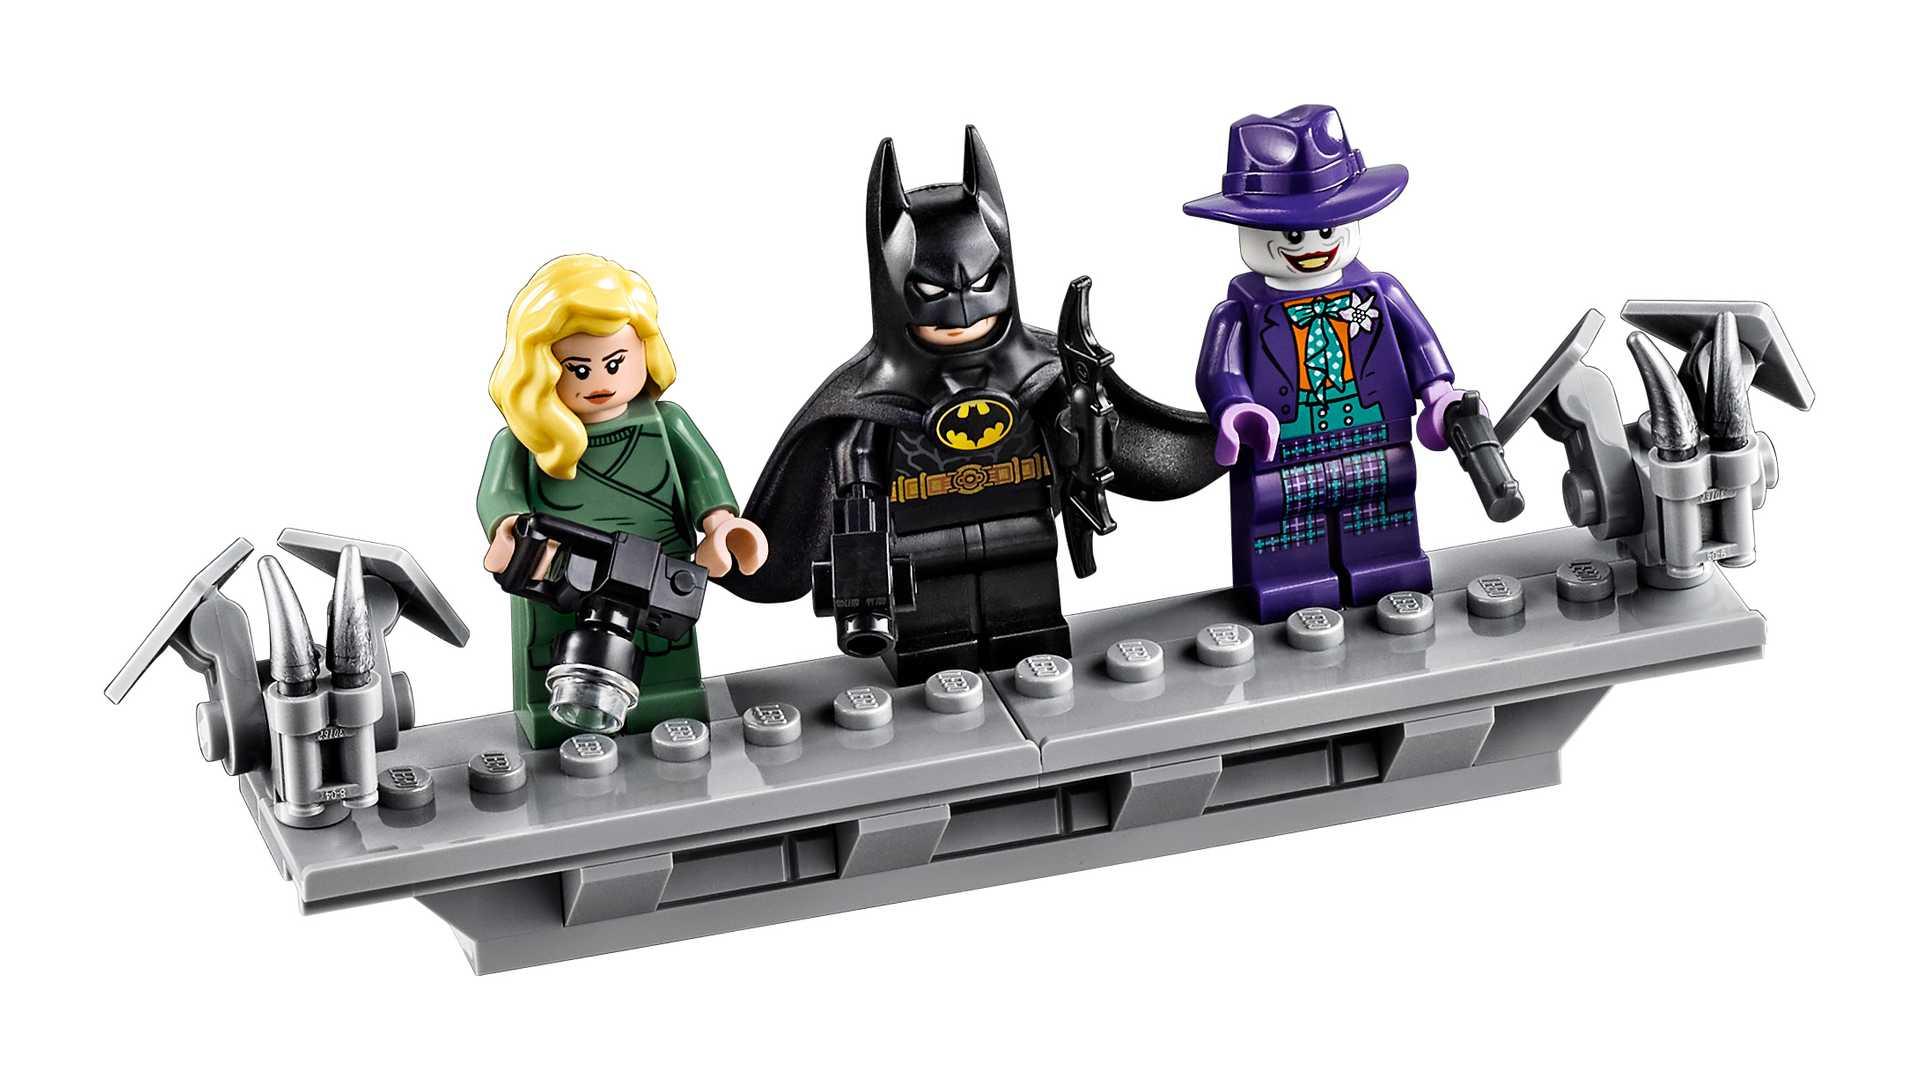 Lego-Batmobile-kit-1989-32